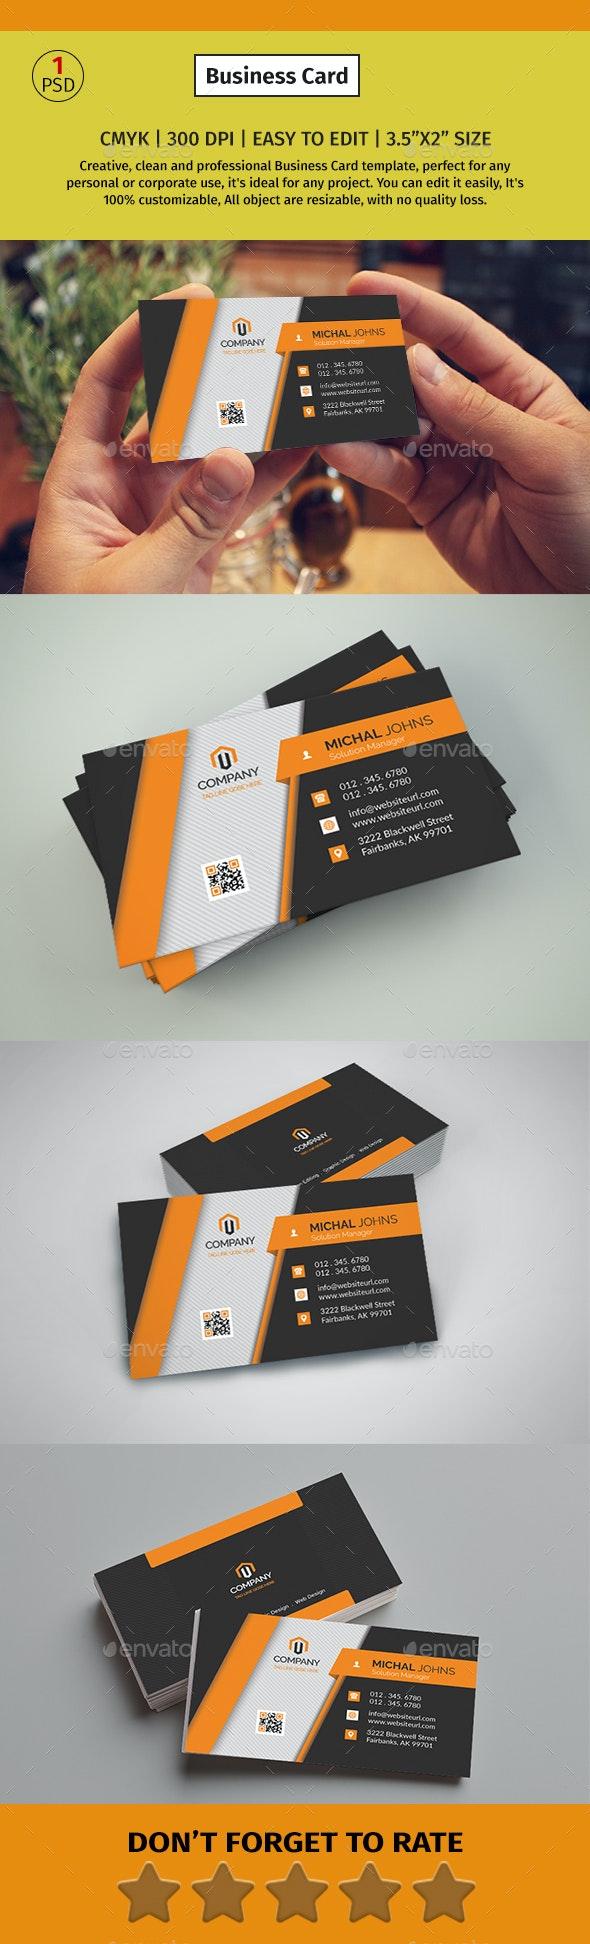 Corporate Business Card #011 - Corporate Business Cards